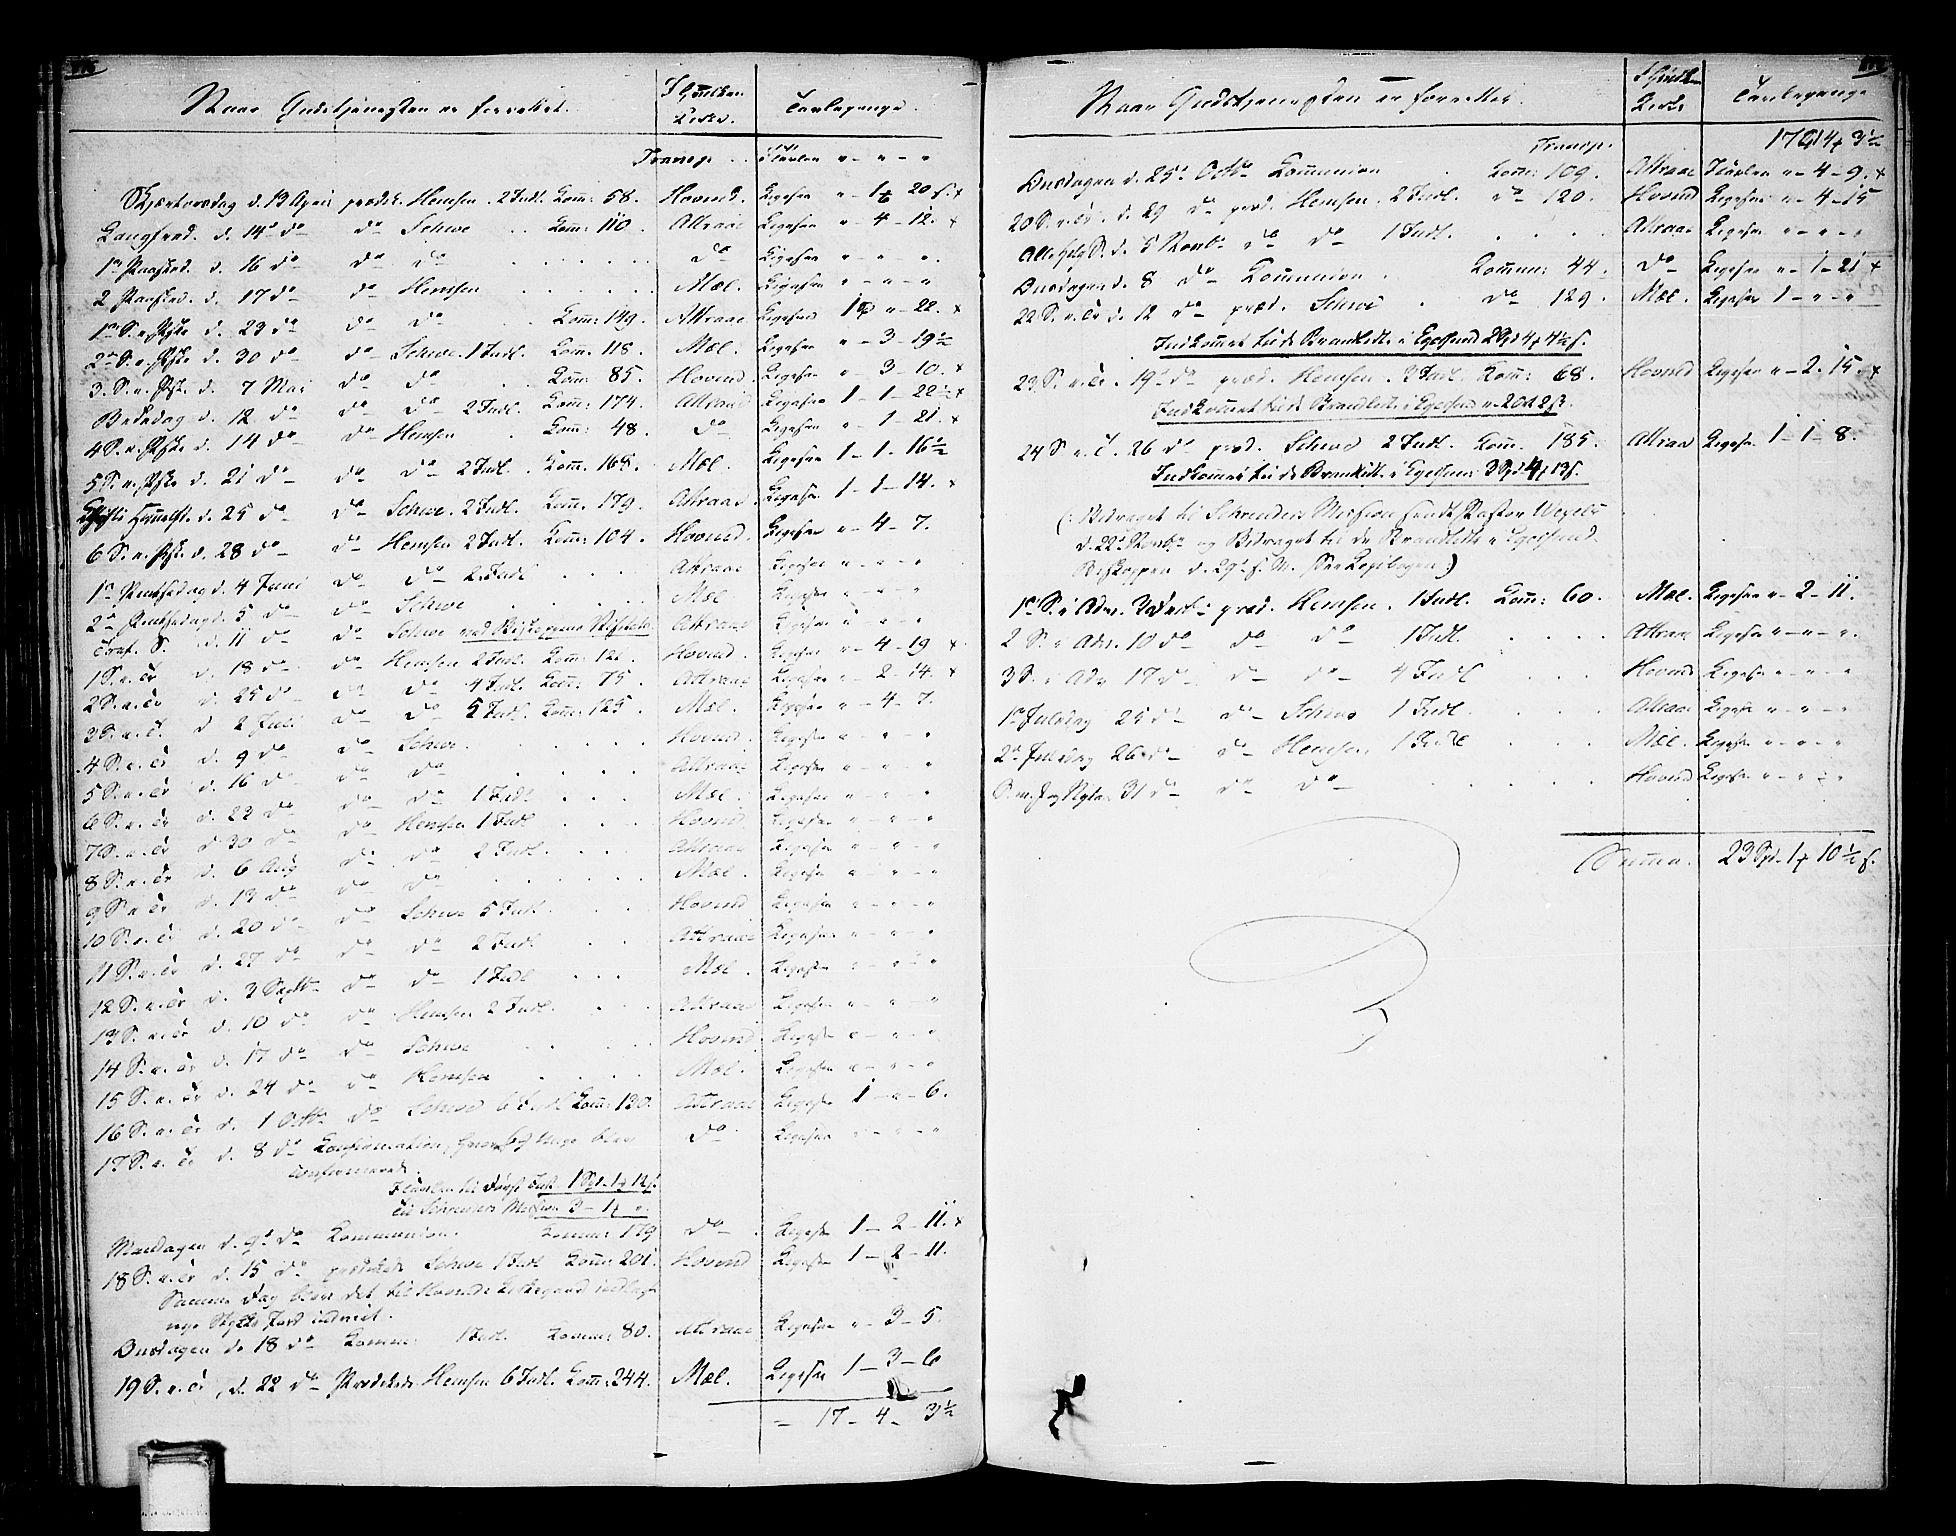 SAKO, Tinn kirkebøker, F/Fa/L0003: Ministerialbok nr. I 3, 1810-1814, s. 176-177